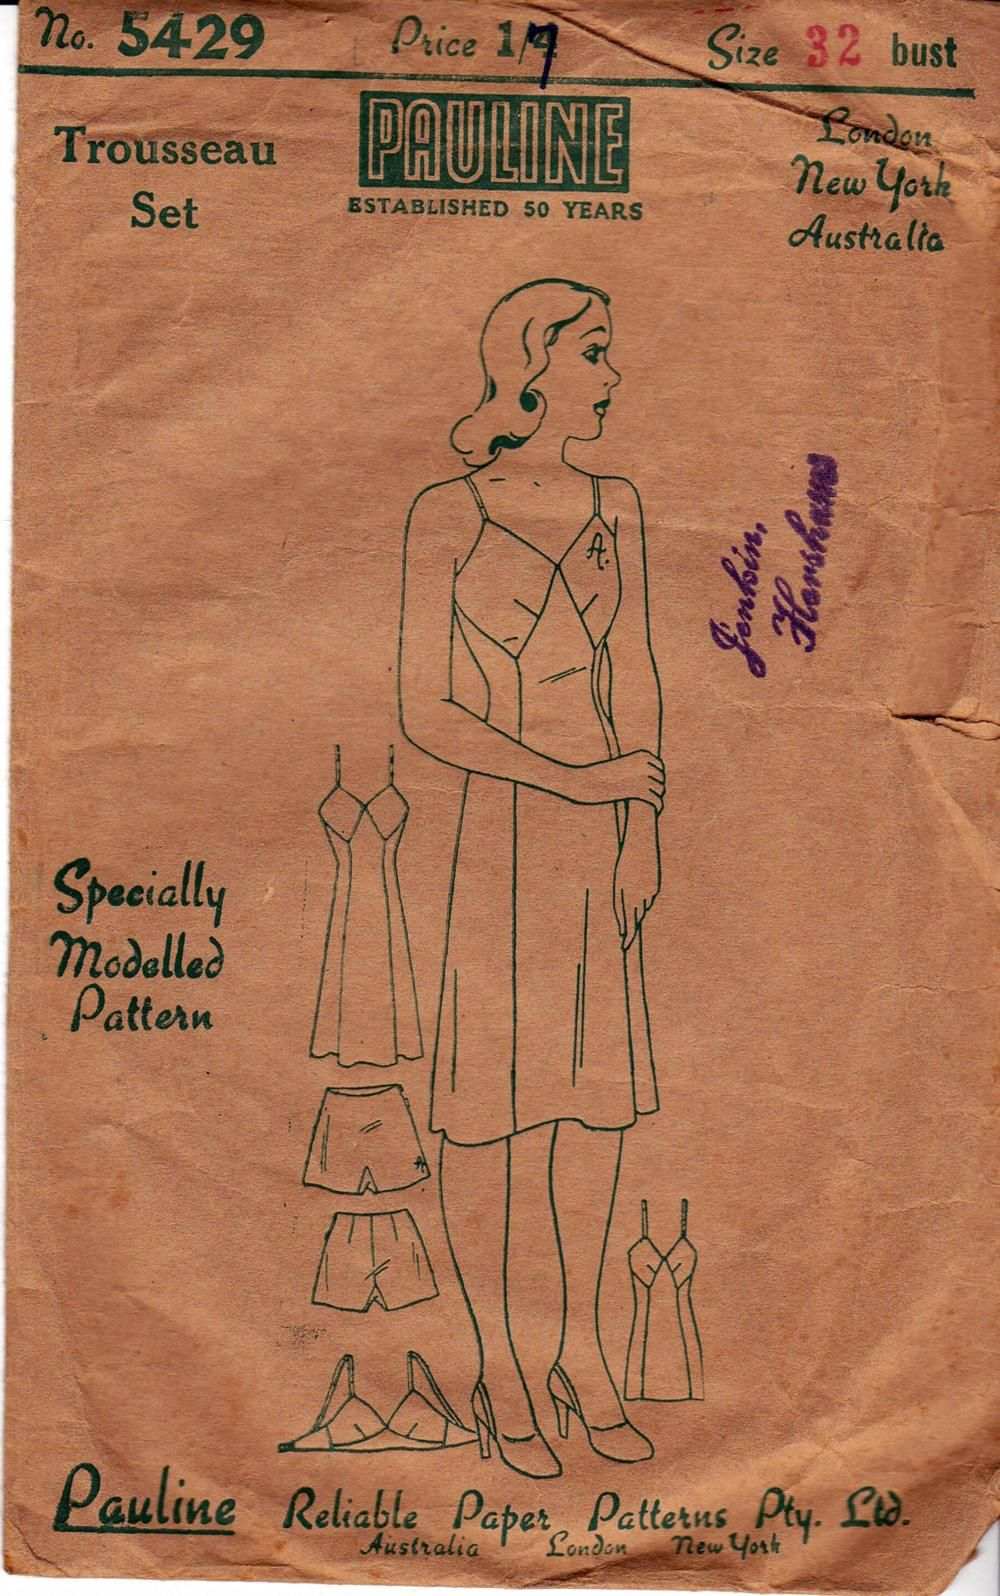 Pauline 5429 Trousseau Set: Slip, Bra, and Panties